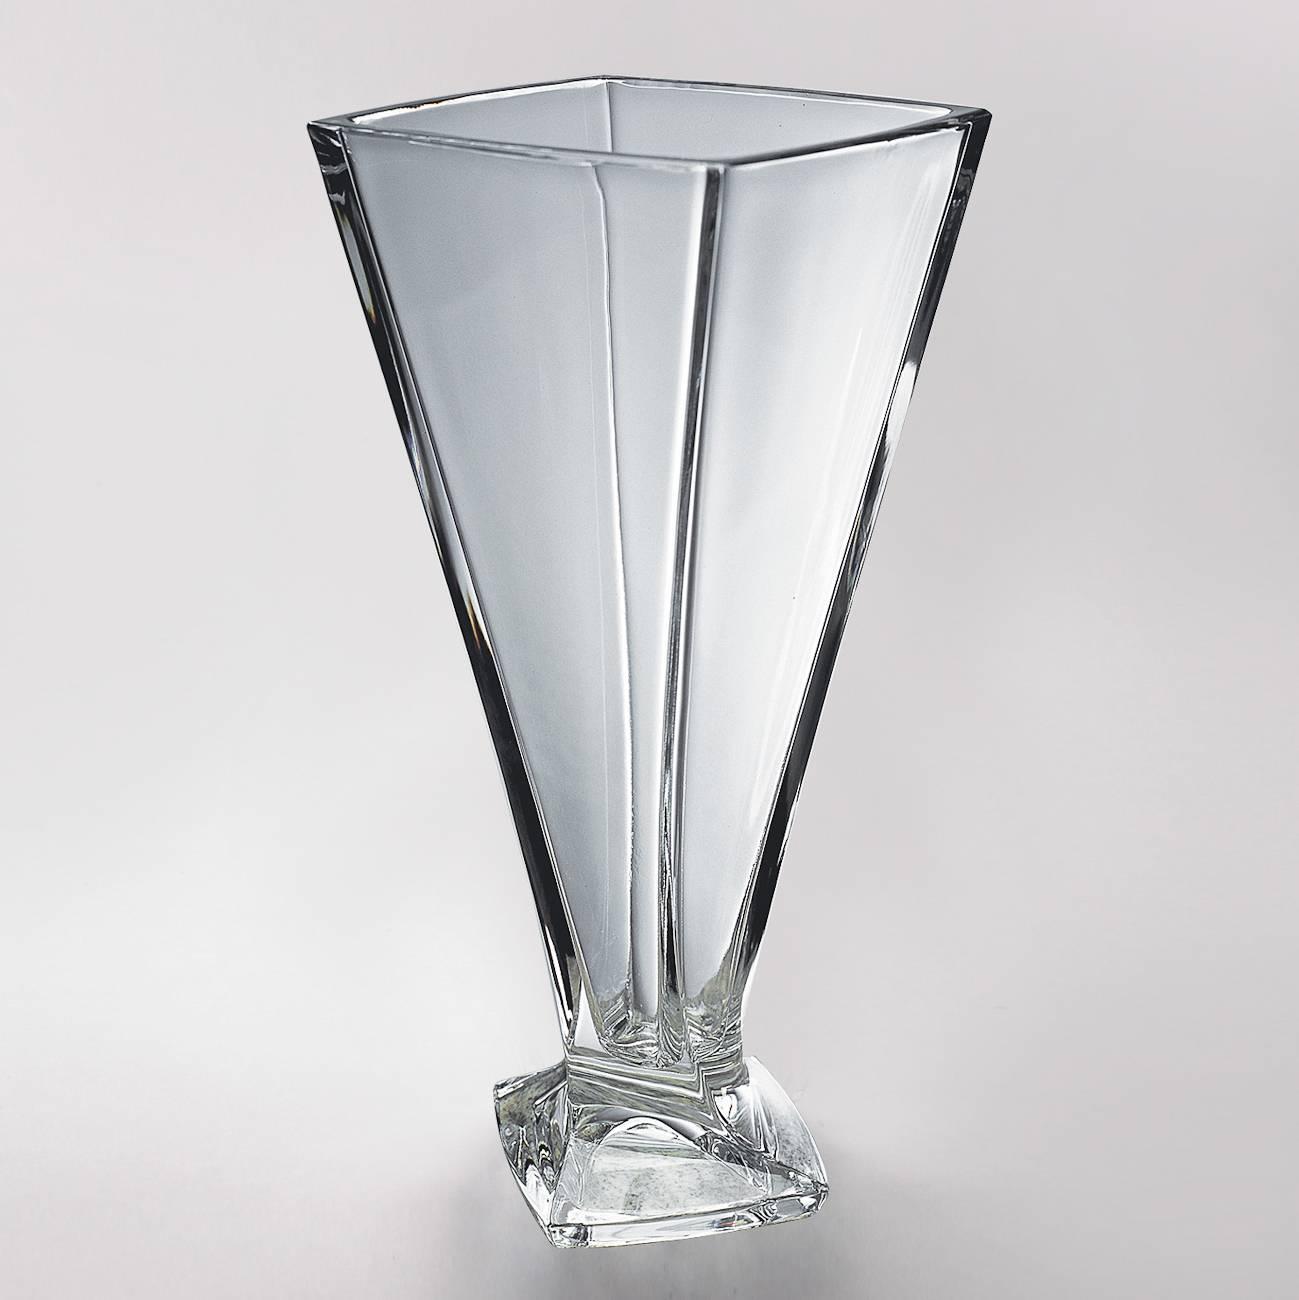 Vaso Quadro em Cristal - Bohemia Crystaline - 33 cm